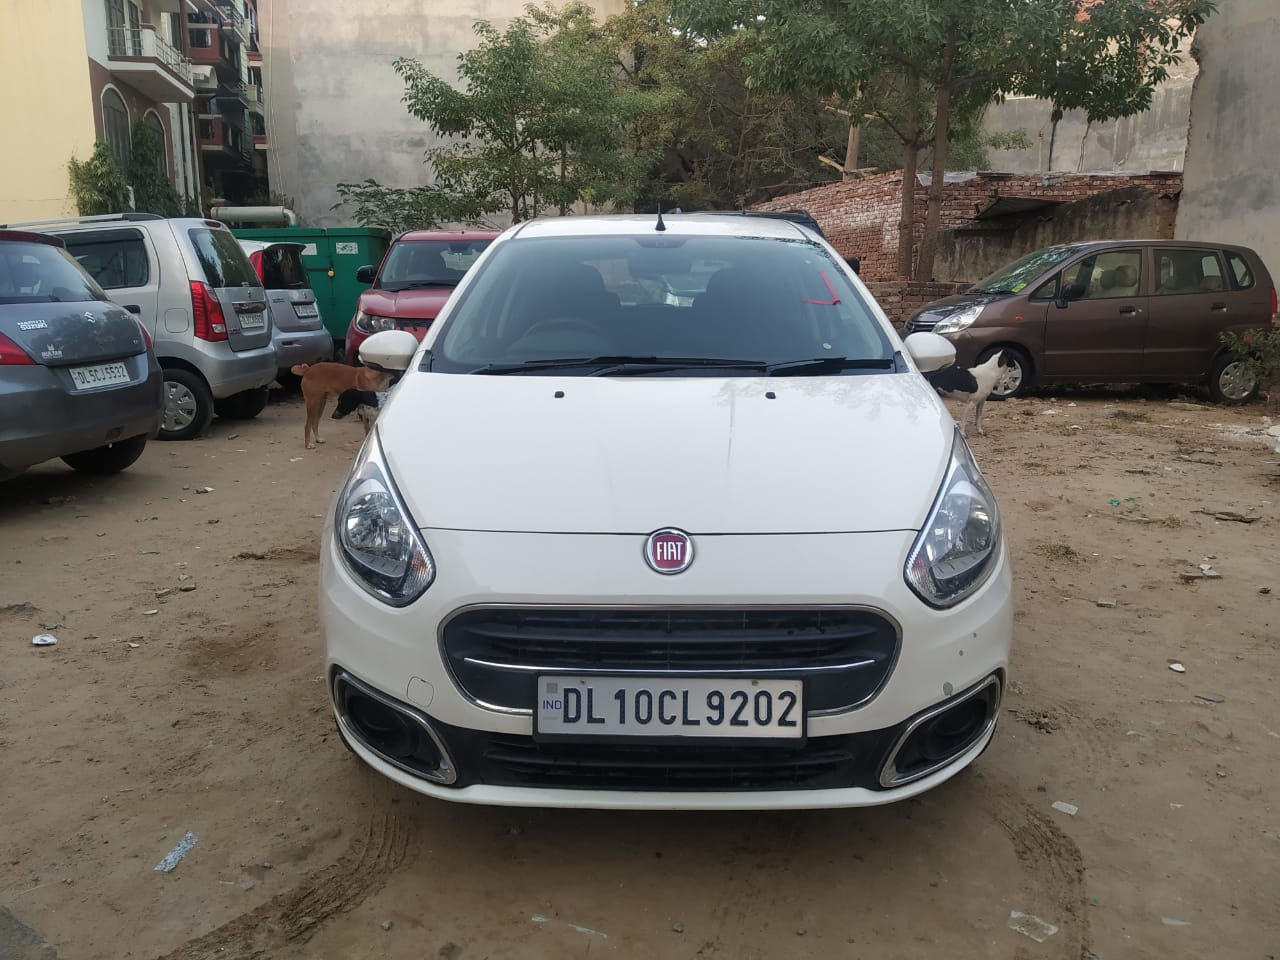 2016 Used Fiat Punto Evo DYNAMIC 1.2